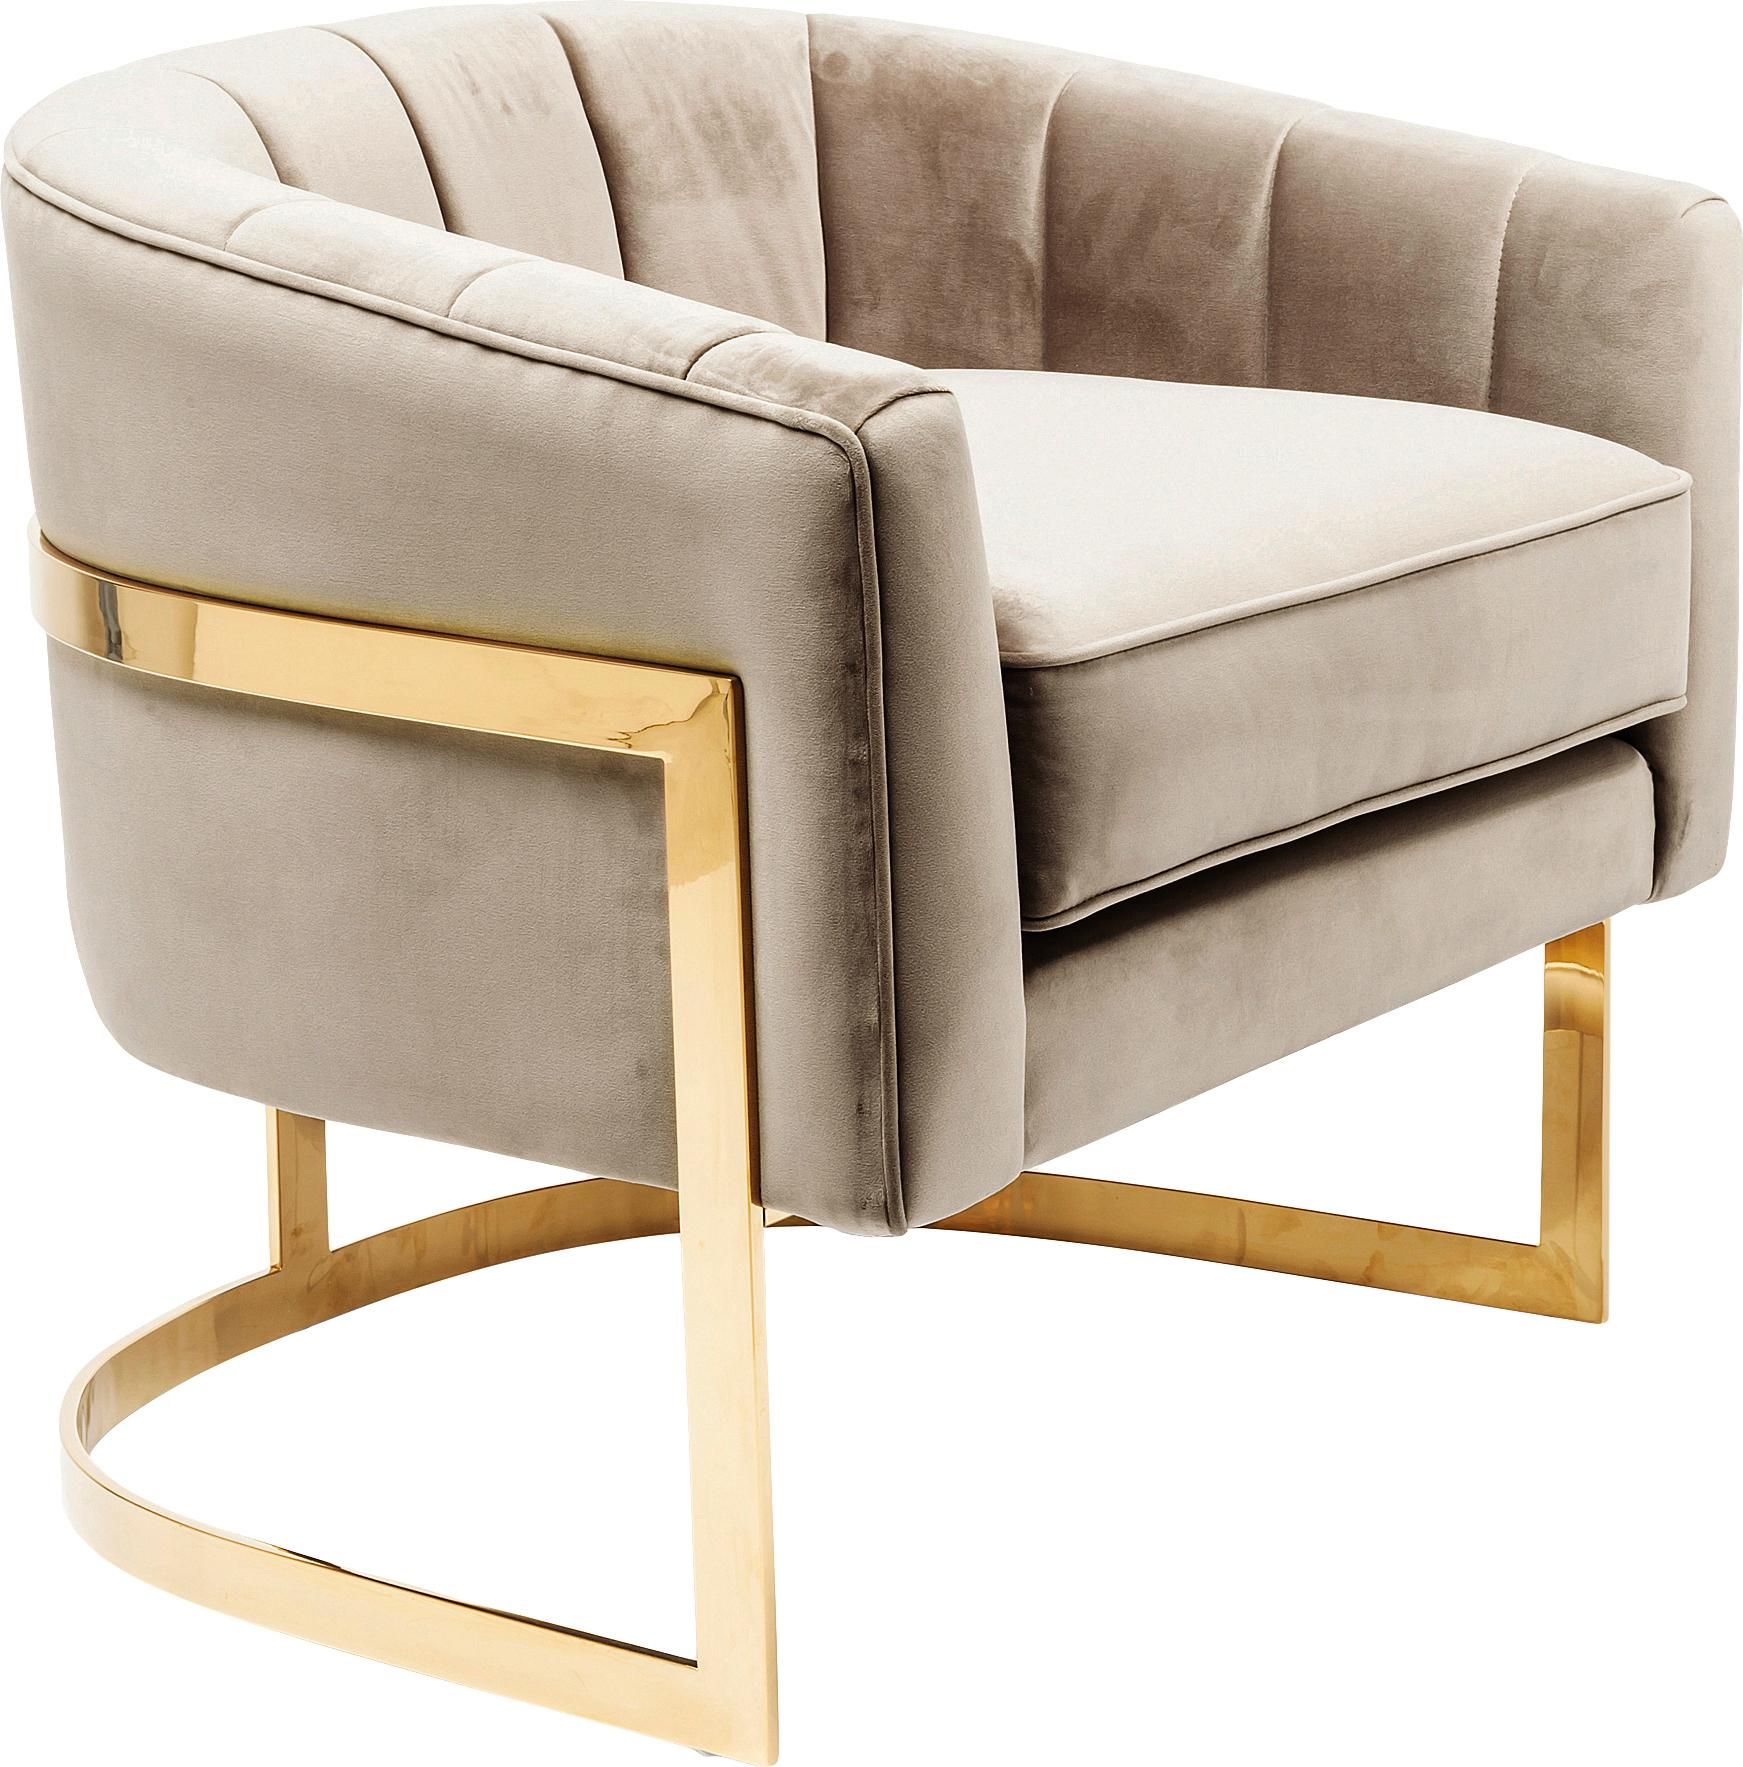 Samt-Loungesessel Pure Elegance in Greige, Bezug: Polyester (Samt), Gestell: Edelstahl, verchromt, Korpus: Kiefer, Massivholz, Samt Greige, B 77 x T 70 cm